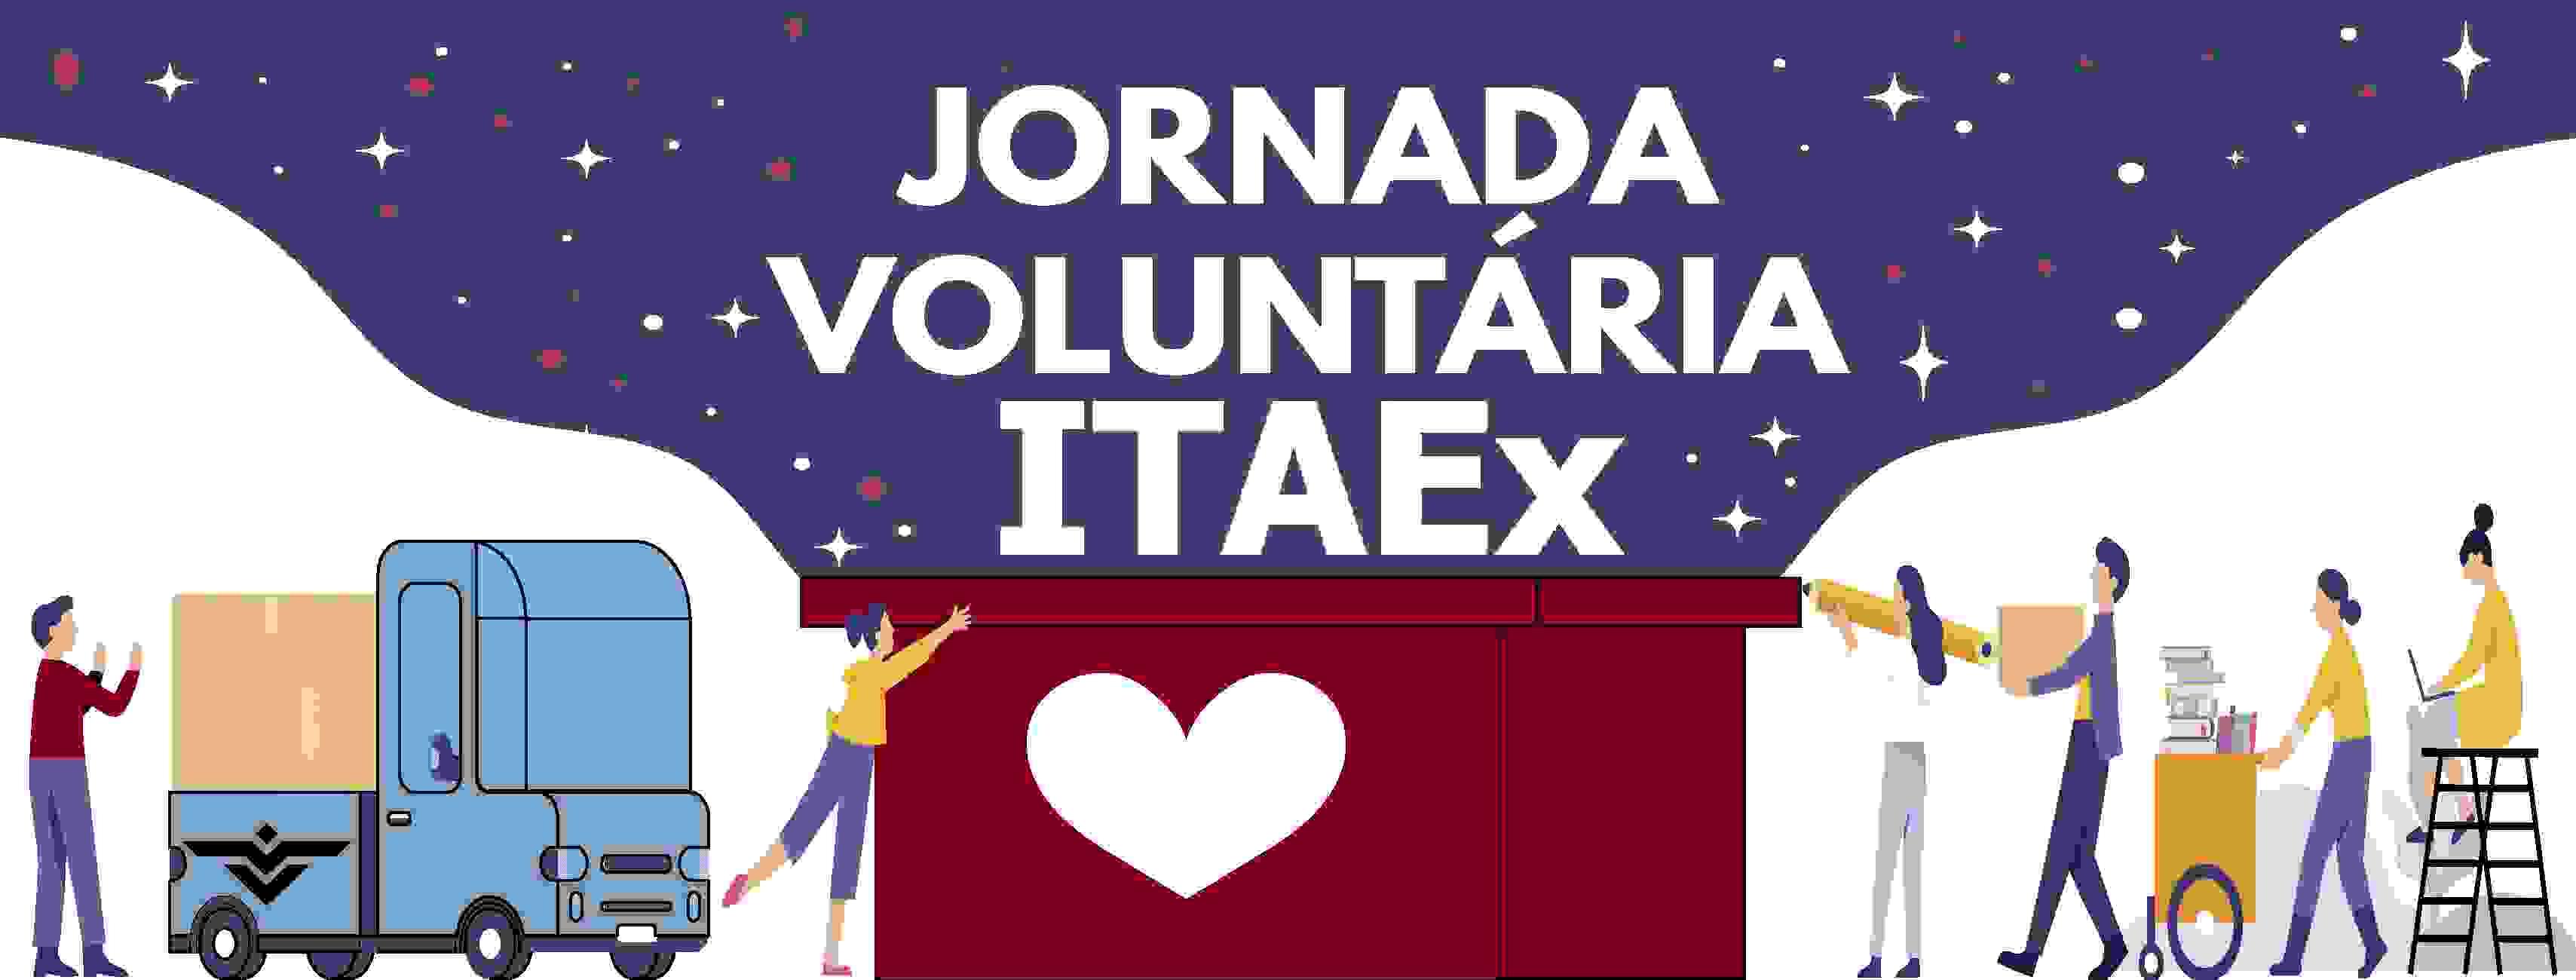 jornada voluntaria banner 2_Prancheta 1-copy-0-com